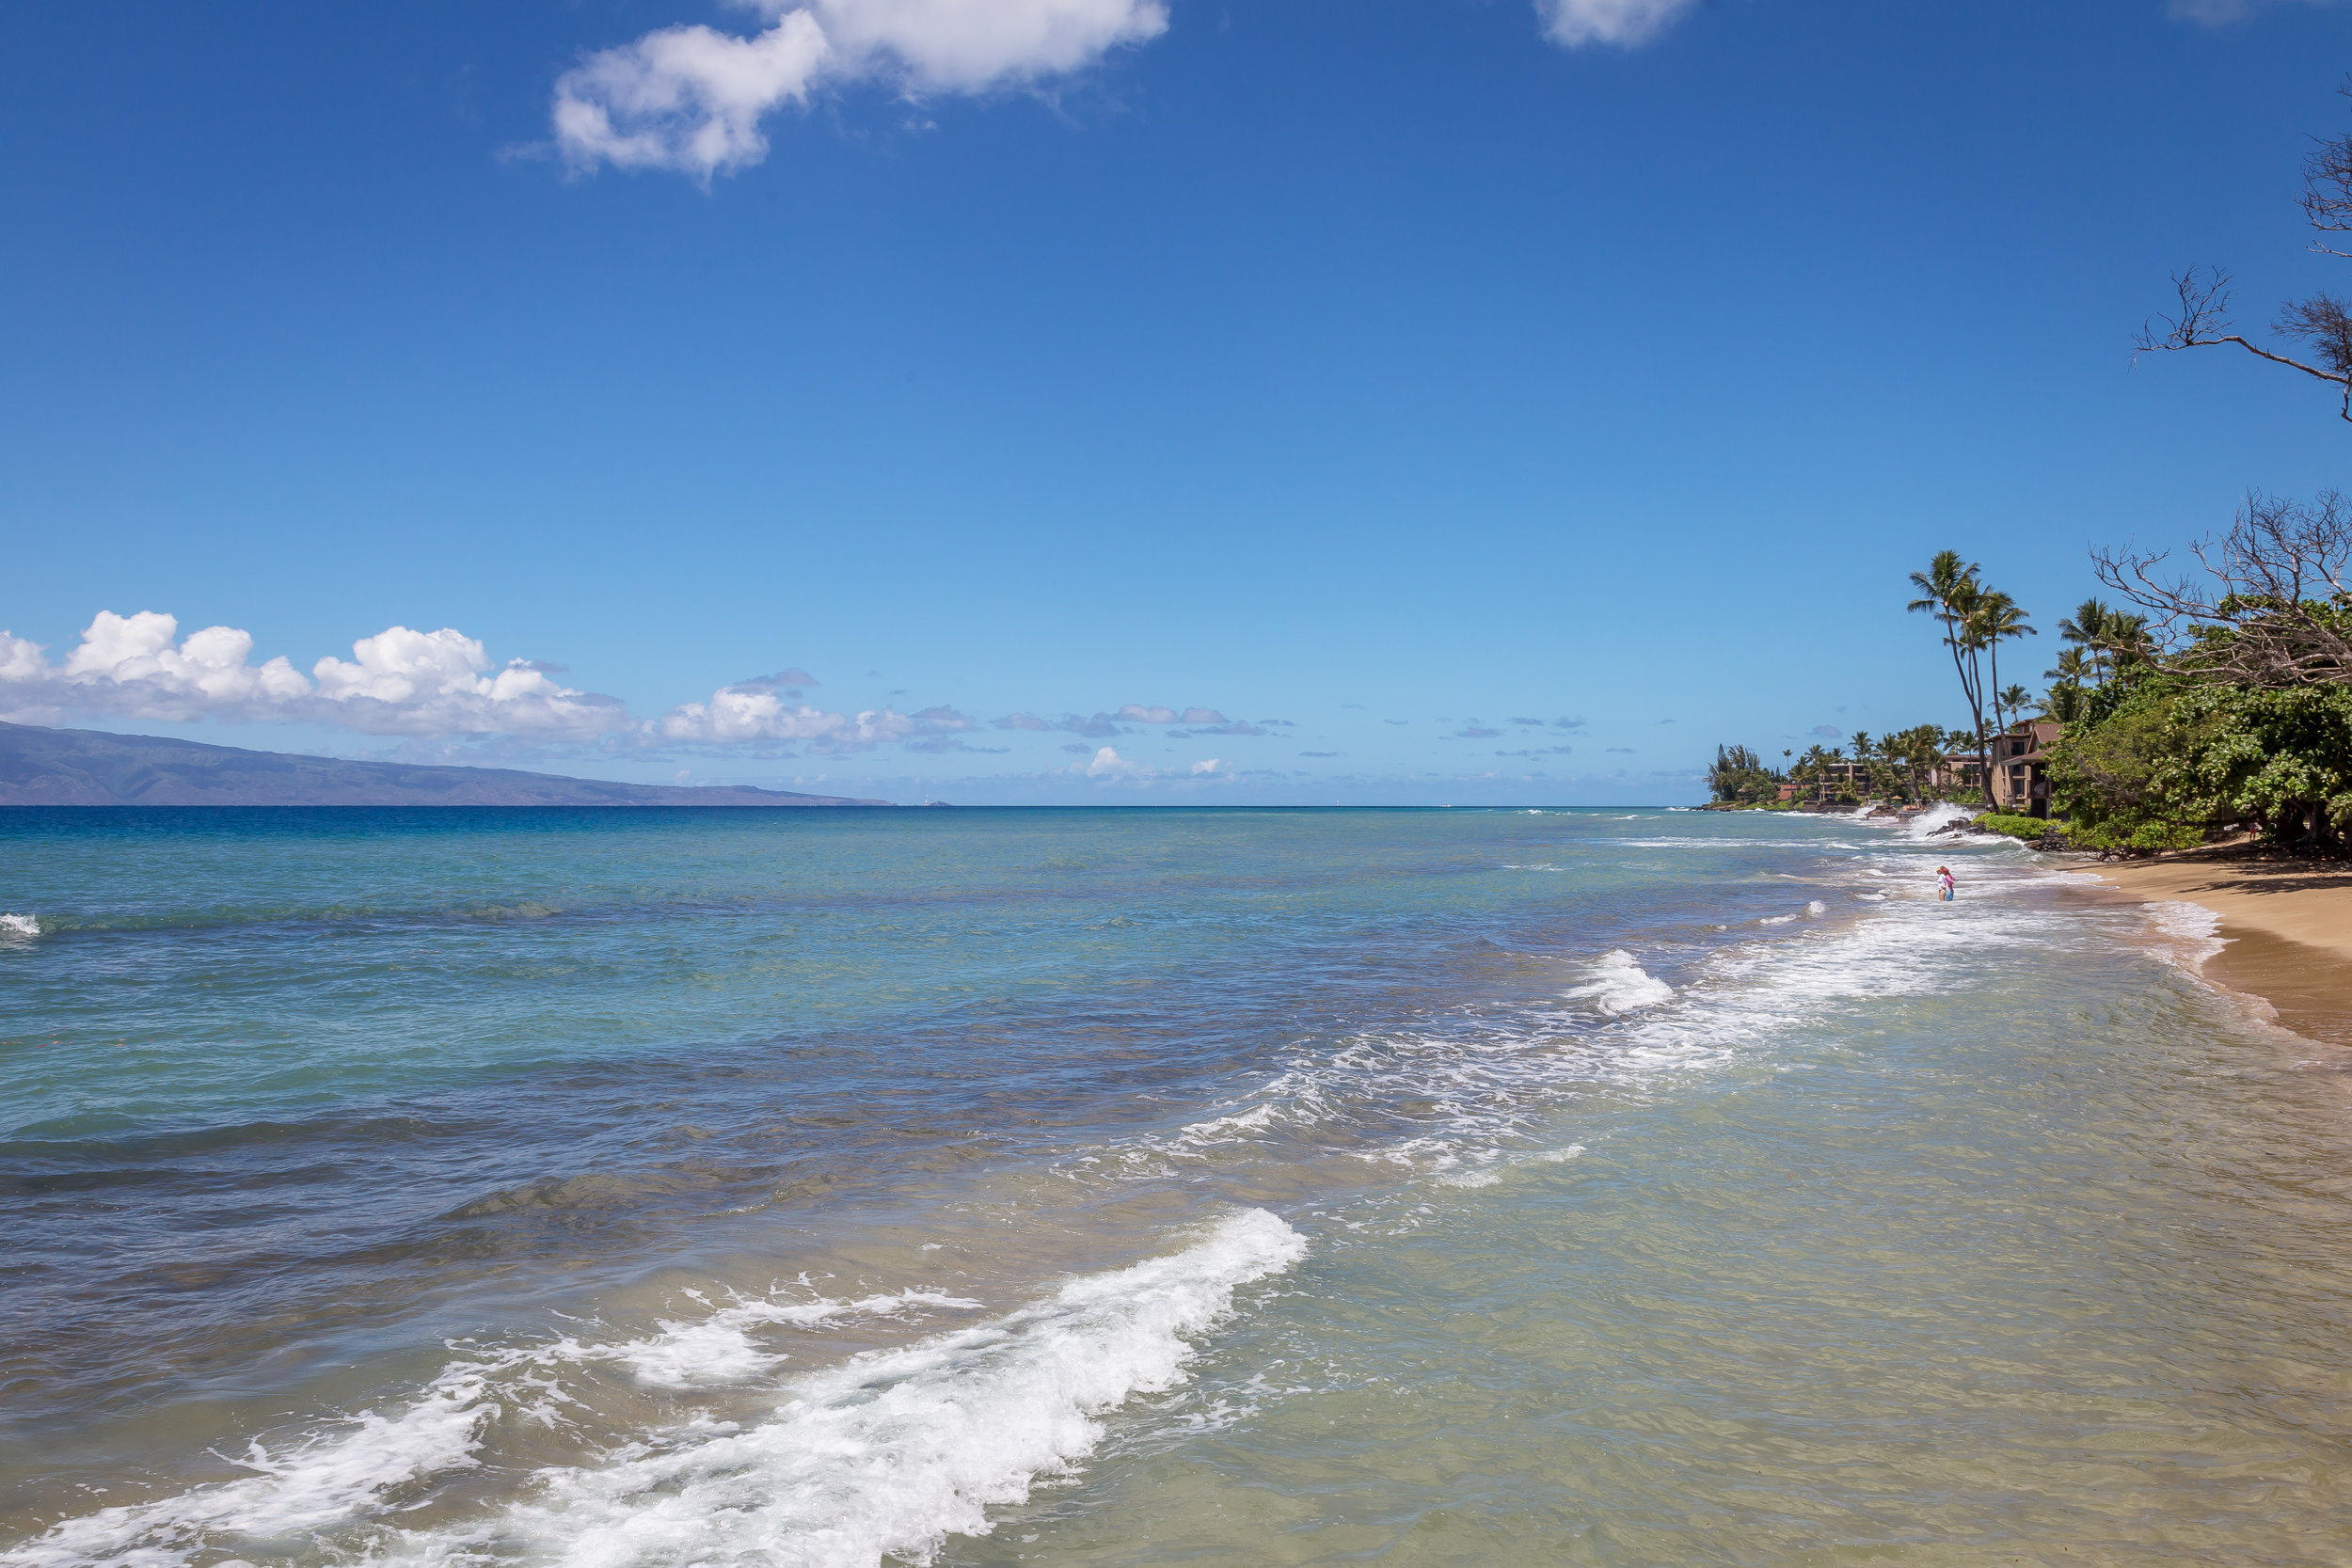 Honokawai Park BeachPaki Maui BeachIMG_7261.jpg